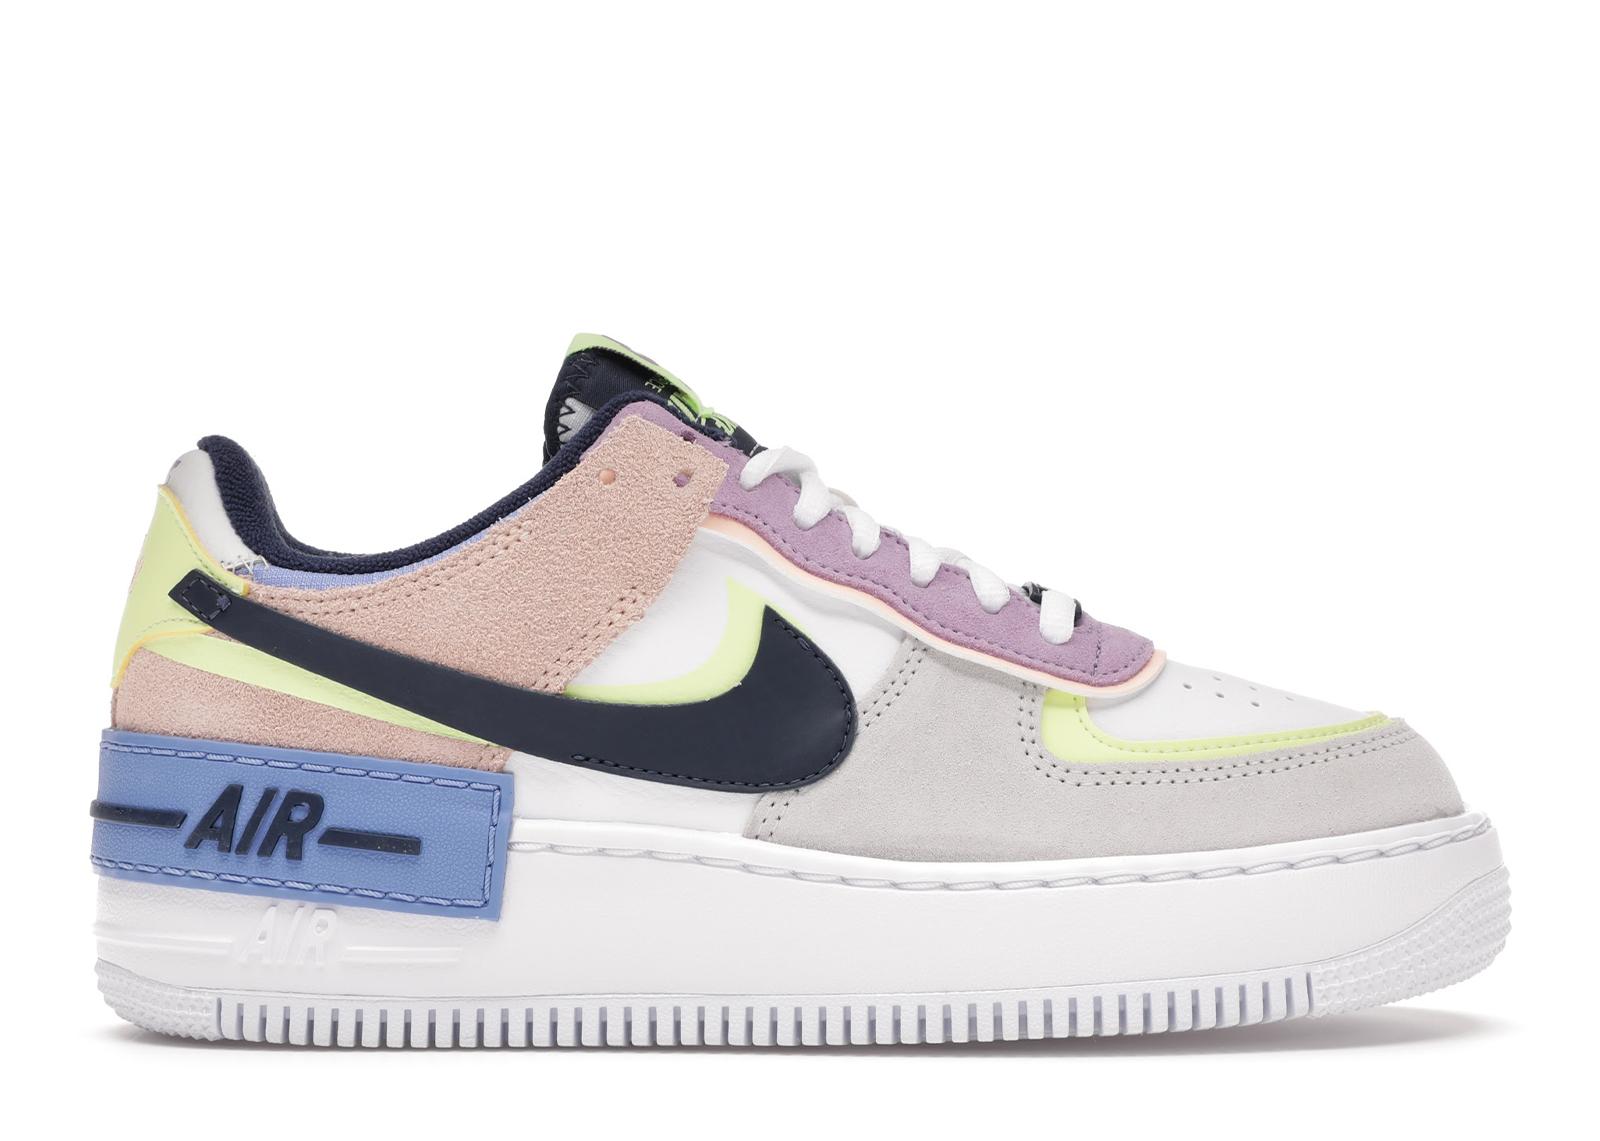 Nike Air Force 1 Shadow Photon Dust Crimson Tint (W)